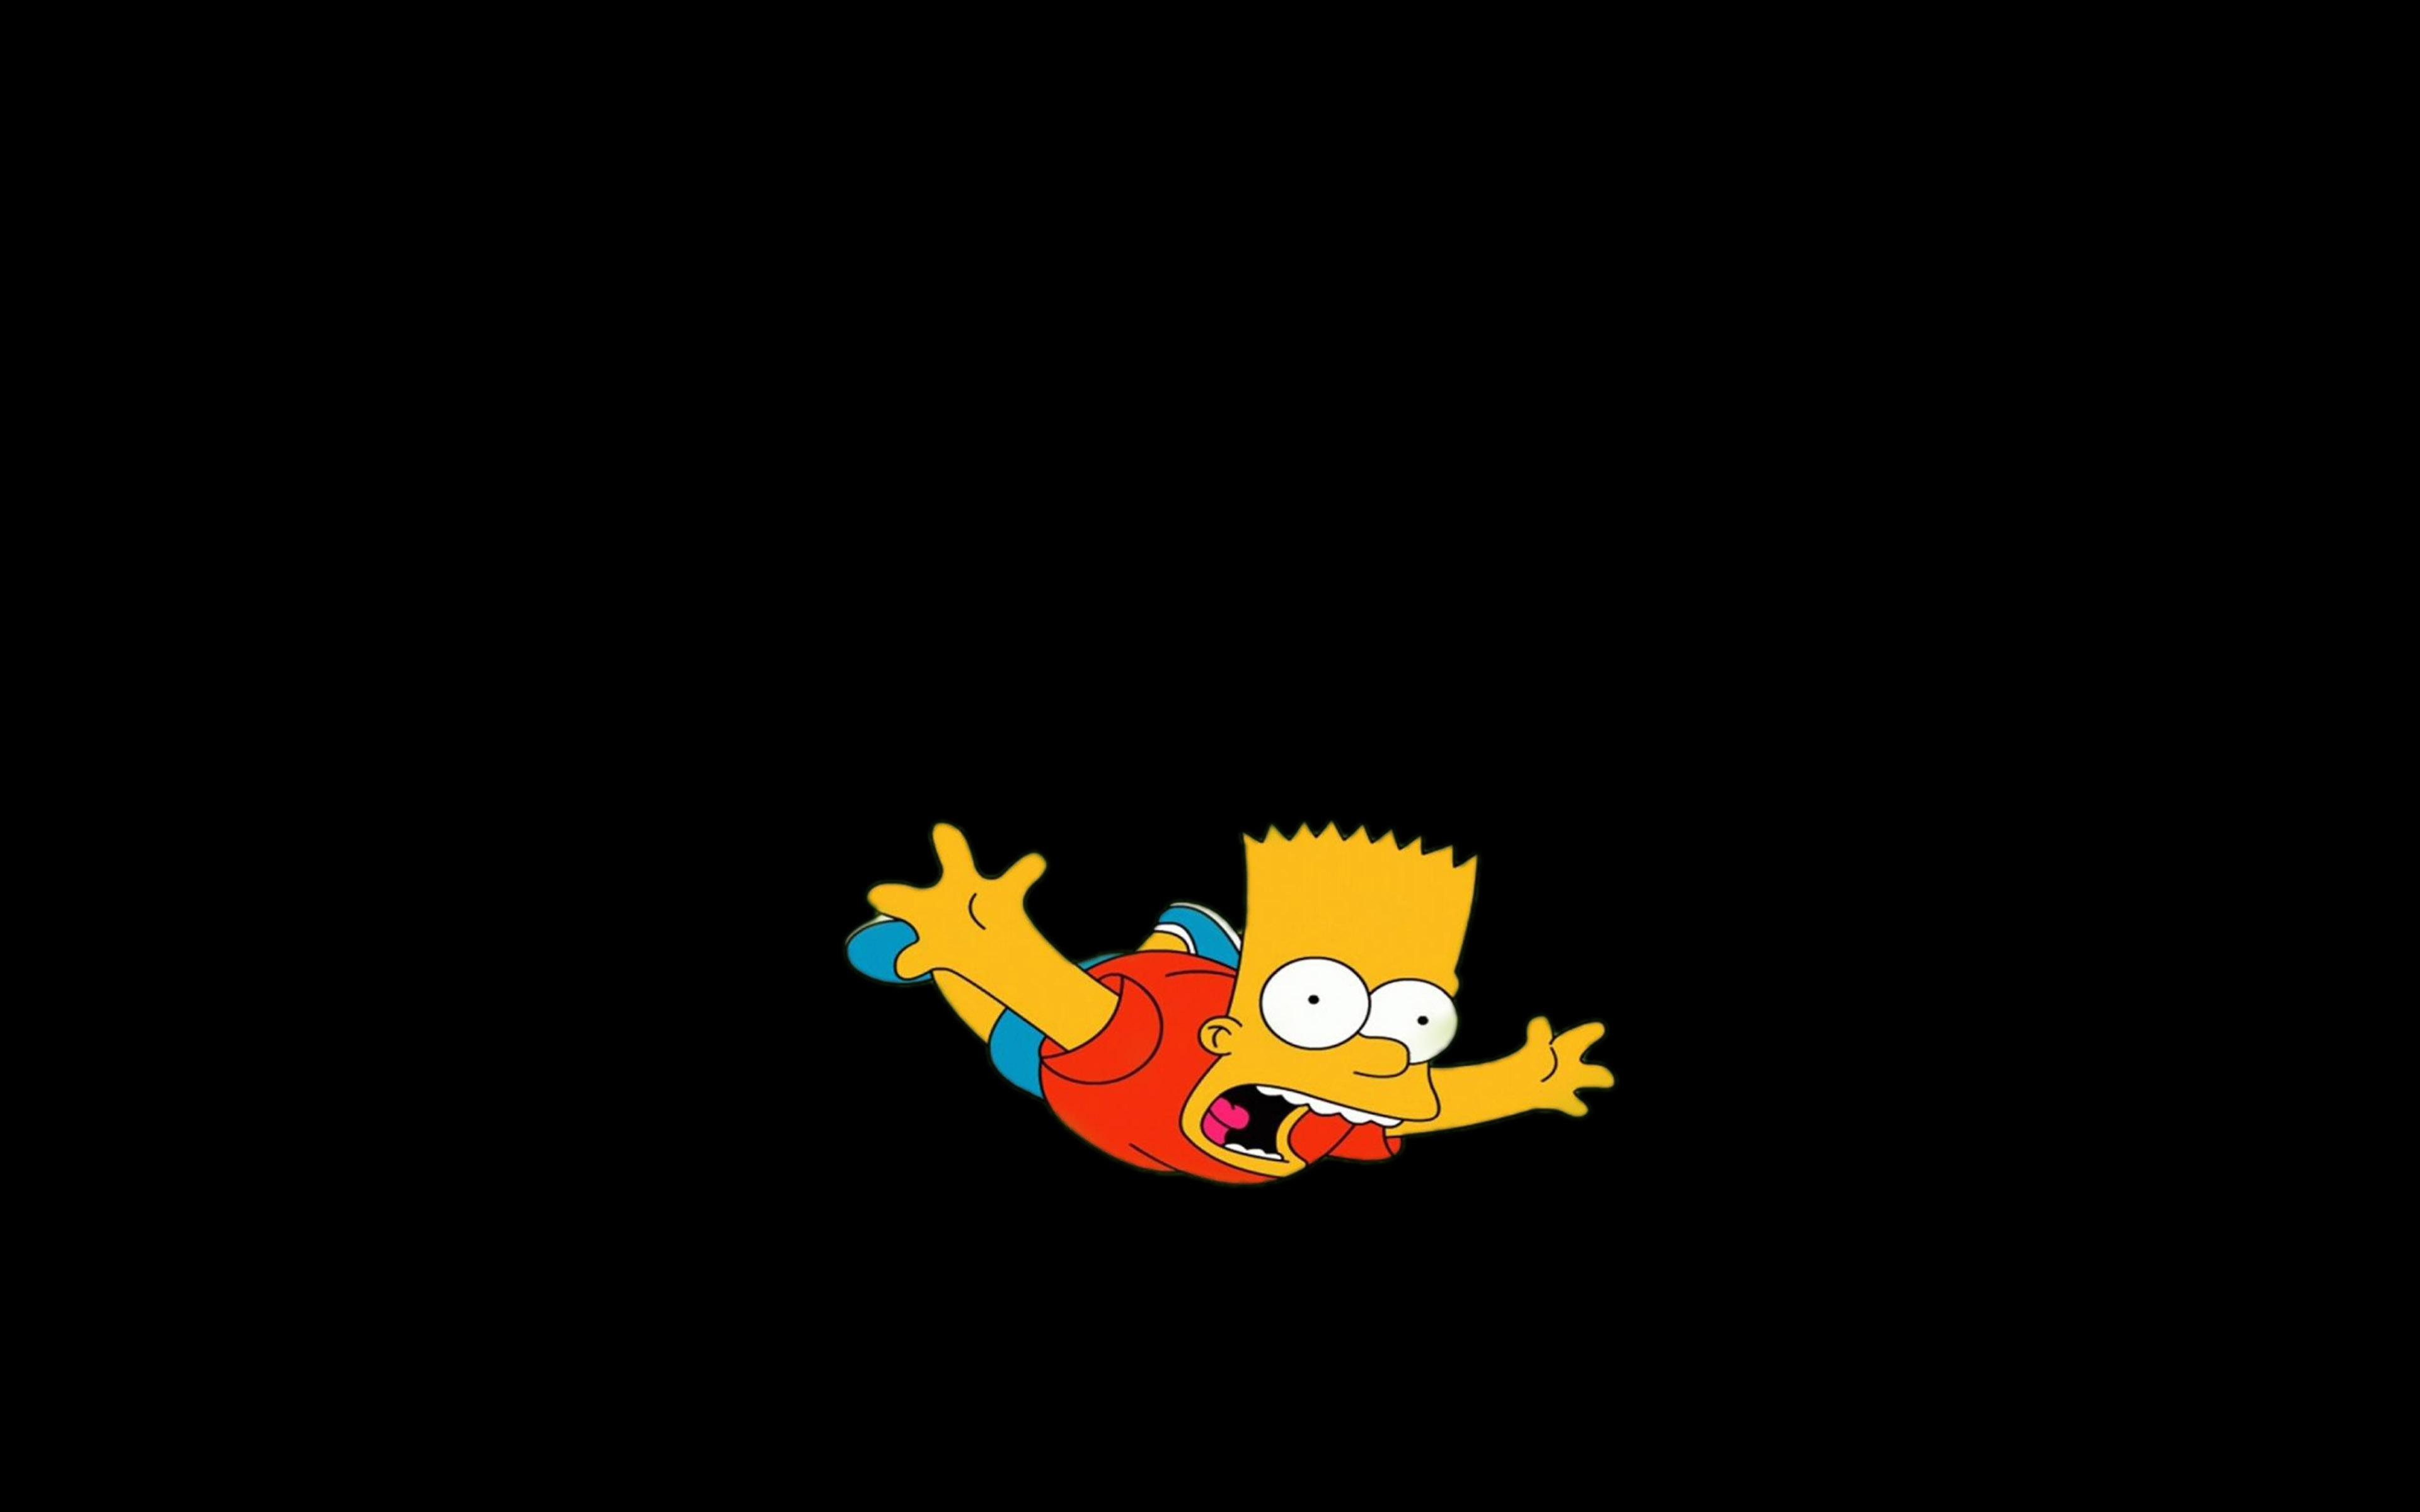 Ag70 Bart Simpson Funny Cute Illlust Papersco